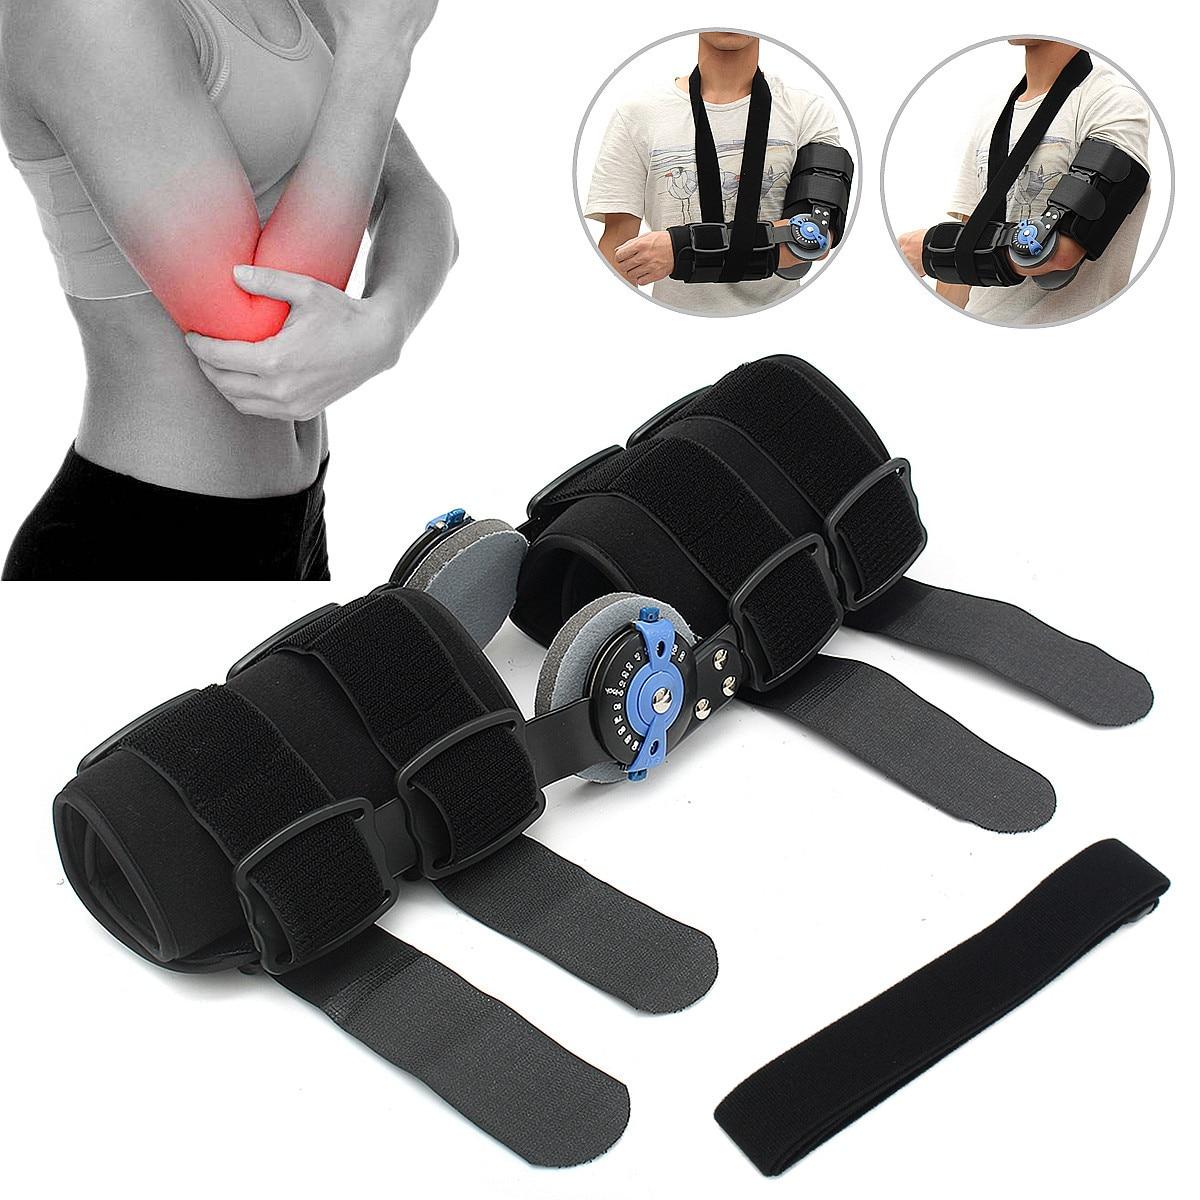 Adjustable Forearm Elbow Arm Sling Brace Support Shoulder Immobilizer With Strap Aluminum Cotton Adjust Fixed Fingers Wrist arm sling shoulder arm elbow brace sling joint support belt